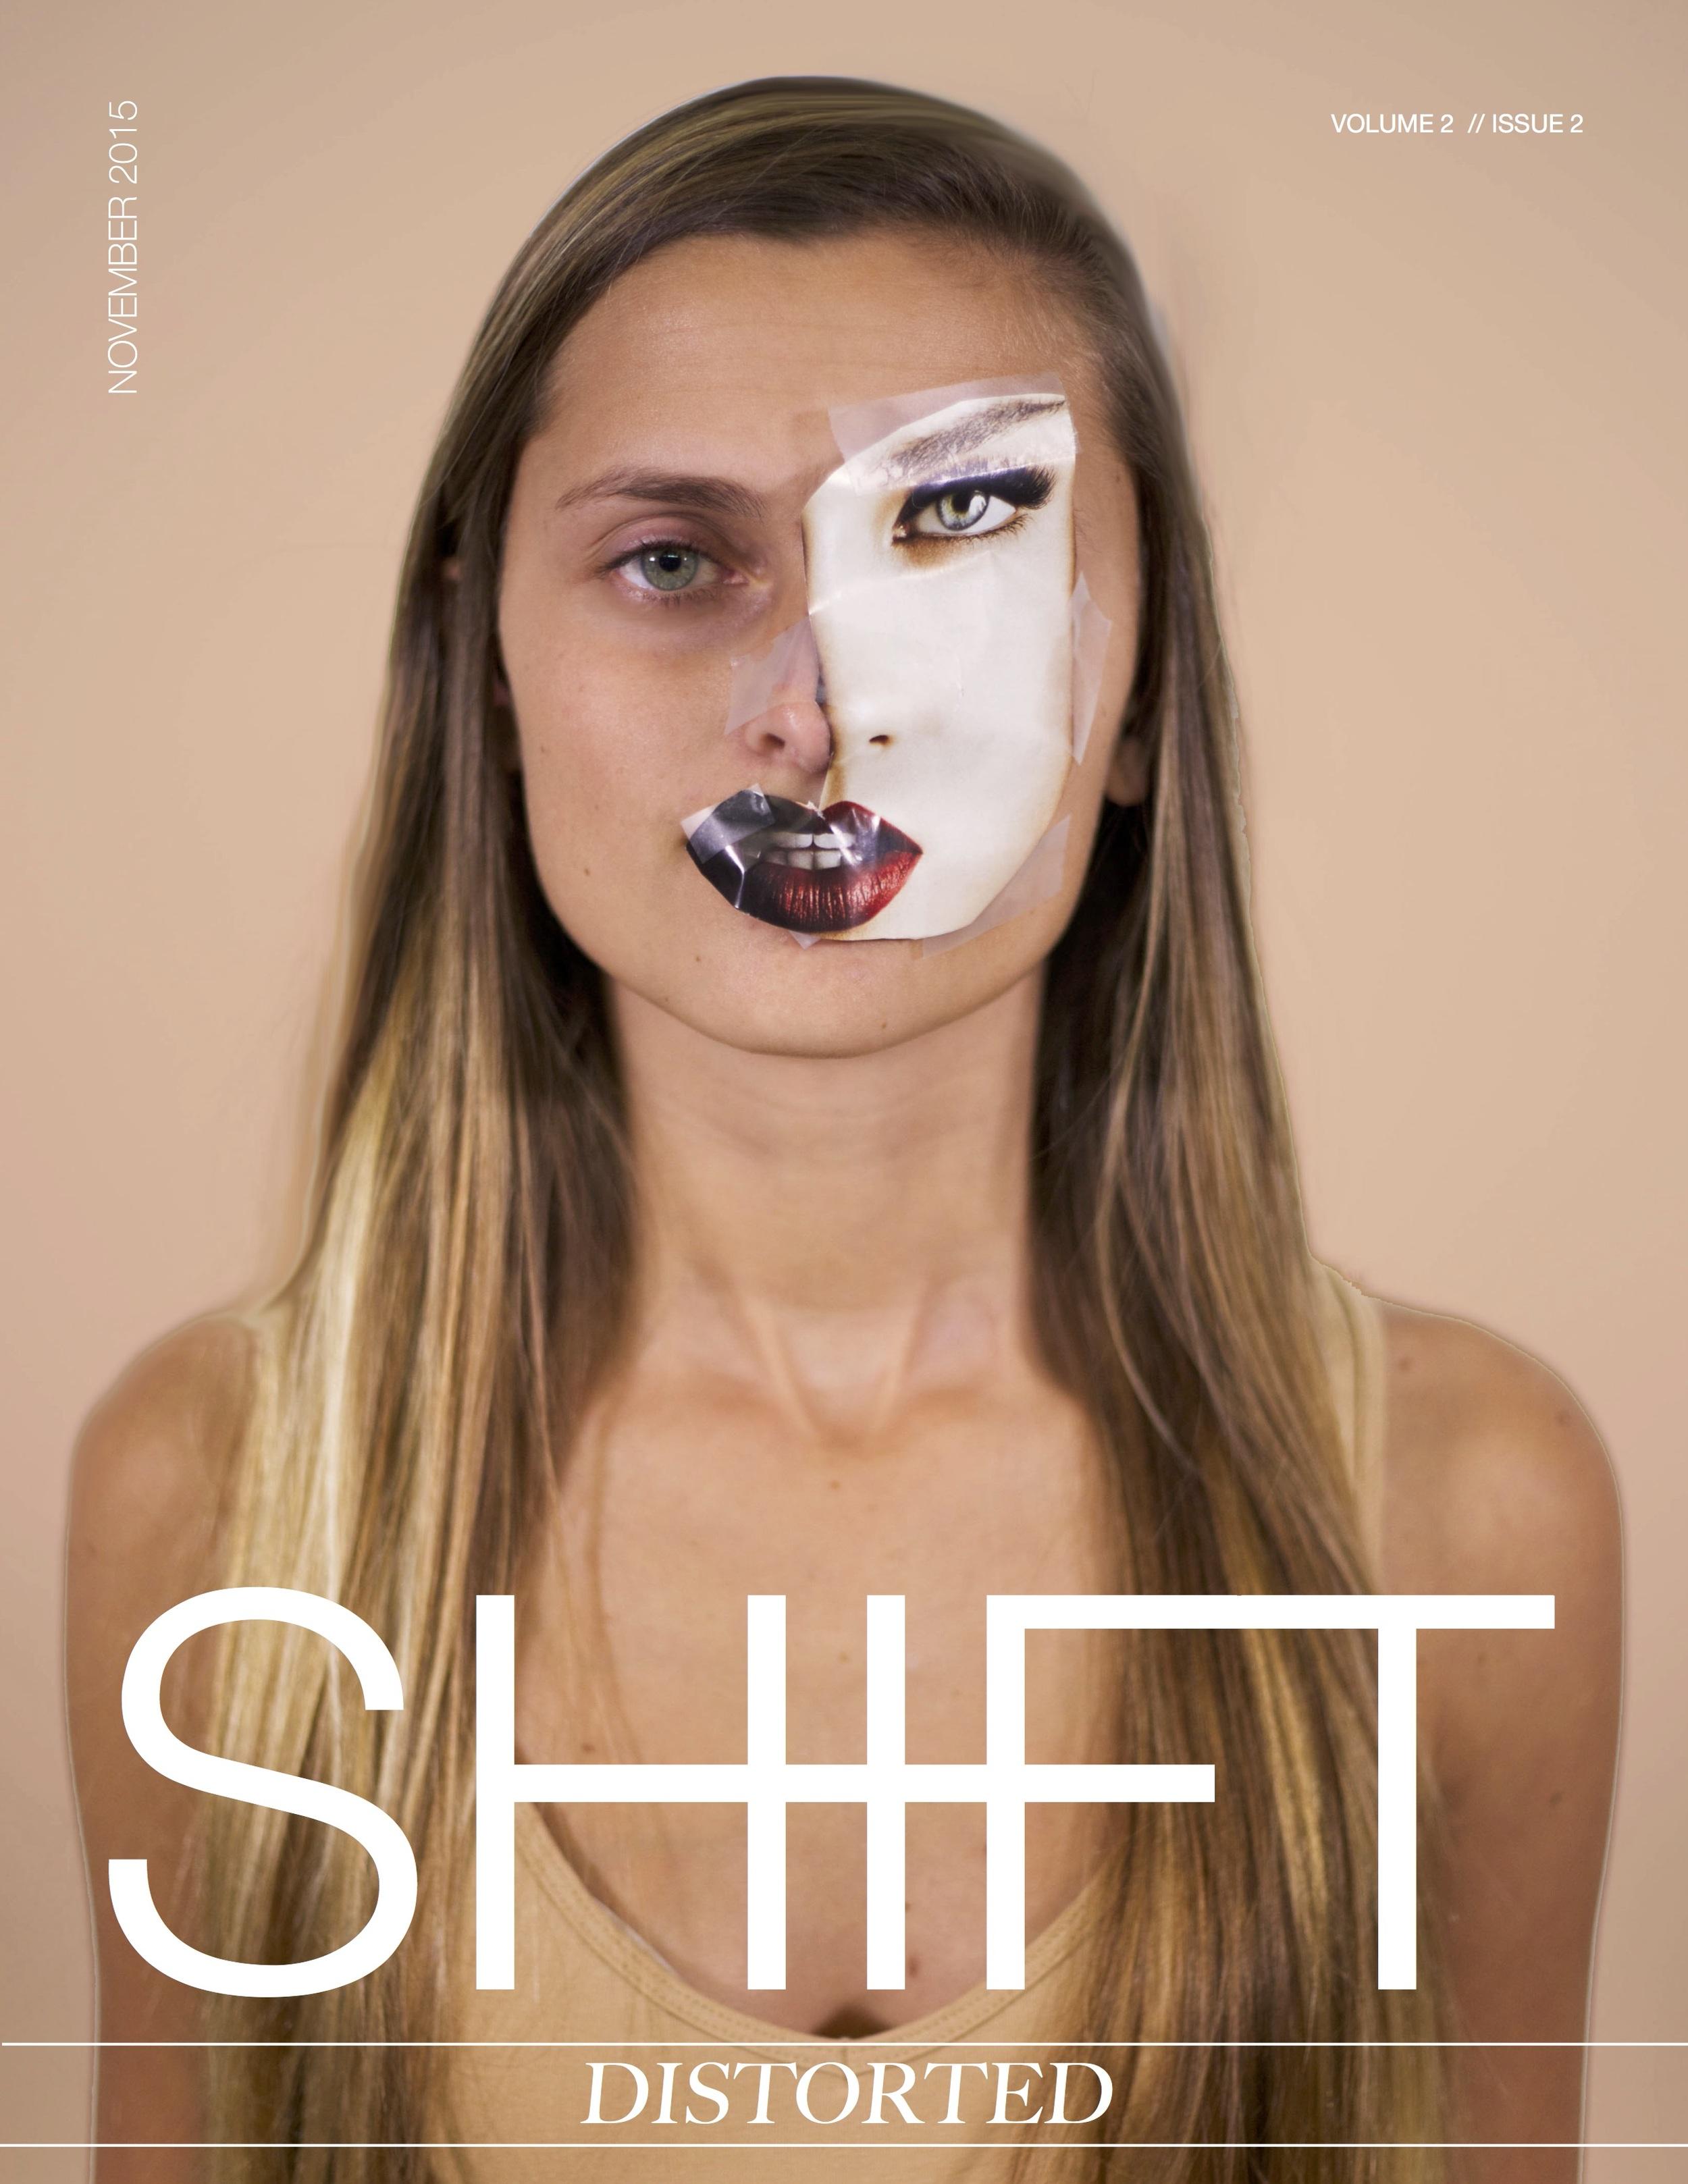 SHIFTv2i2_Cover (2).jpg